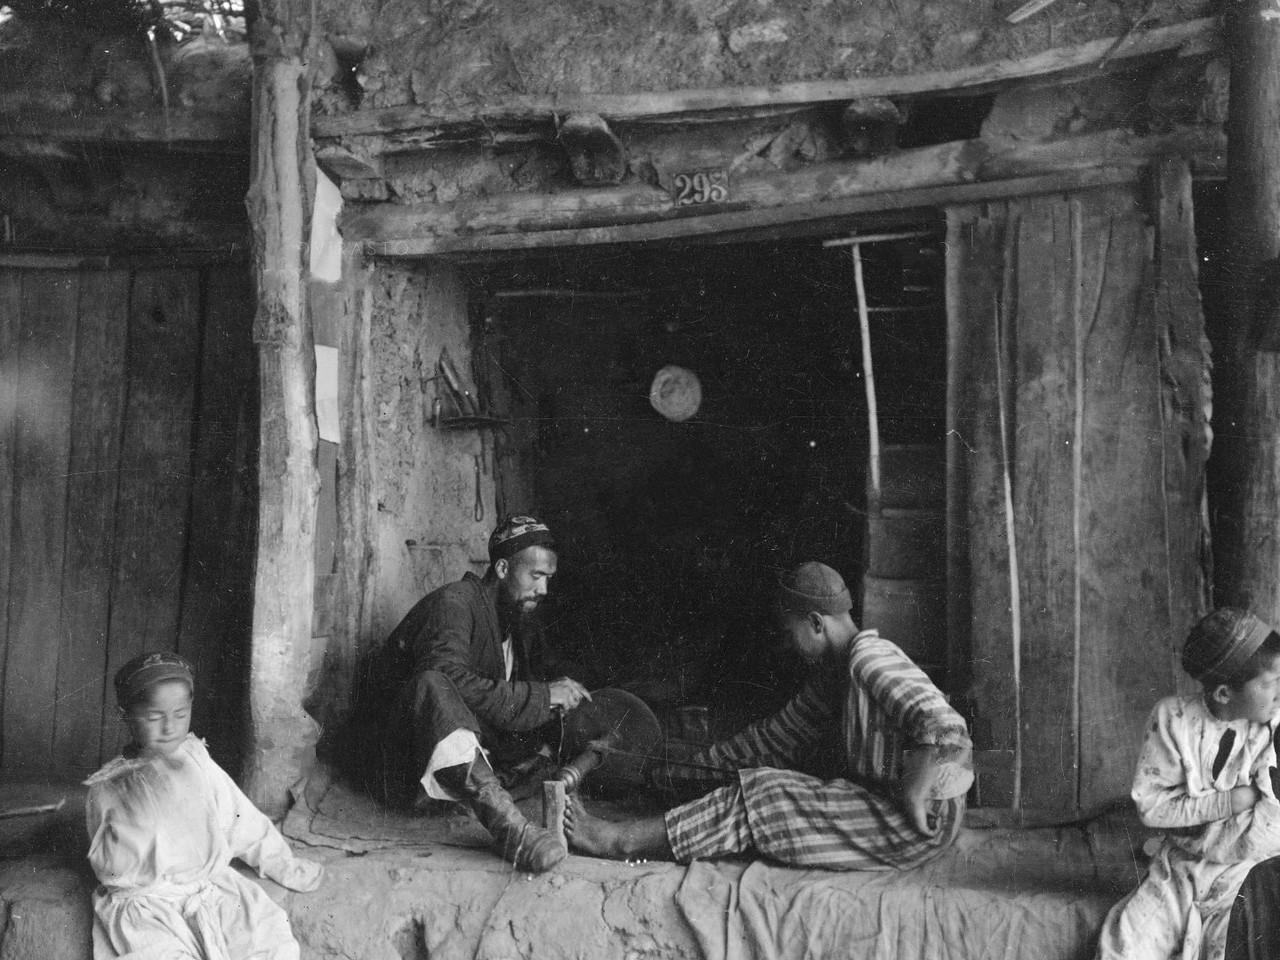 Мужчина затачивает нож — черно-бела фотография